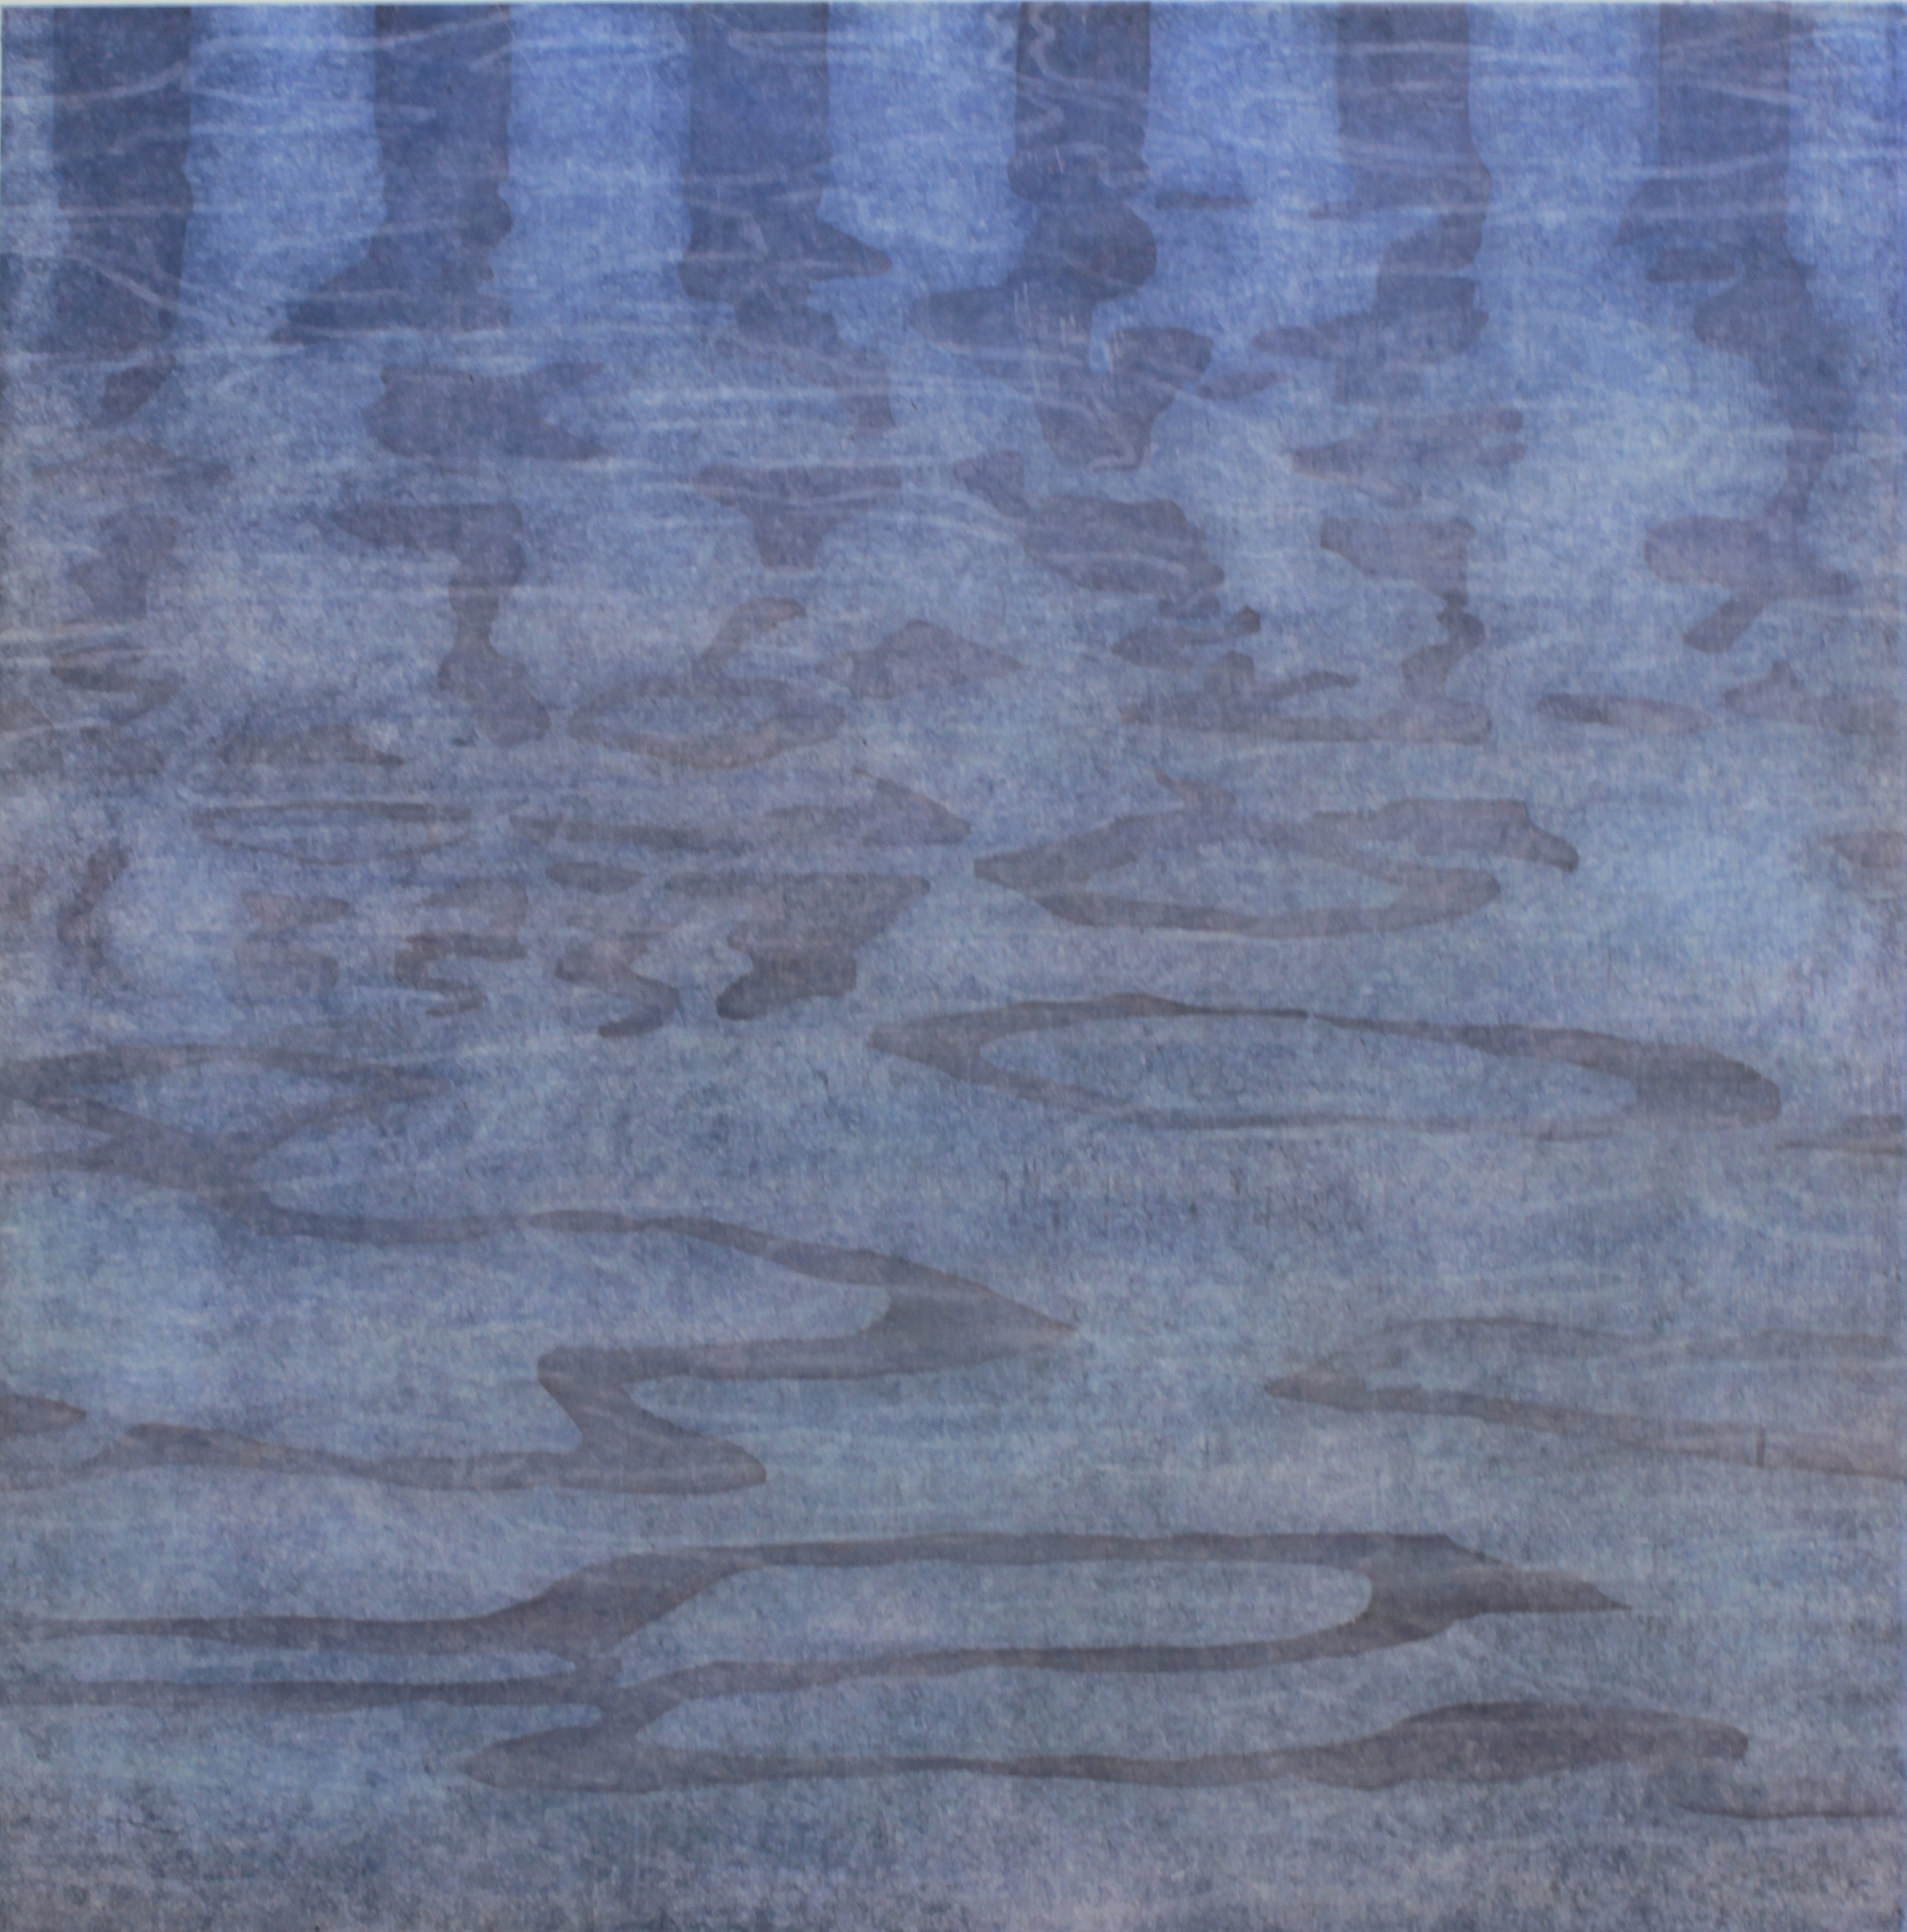 70. Heijastus - Reflection